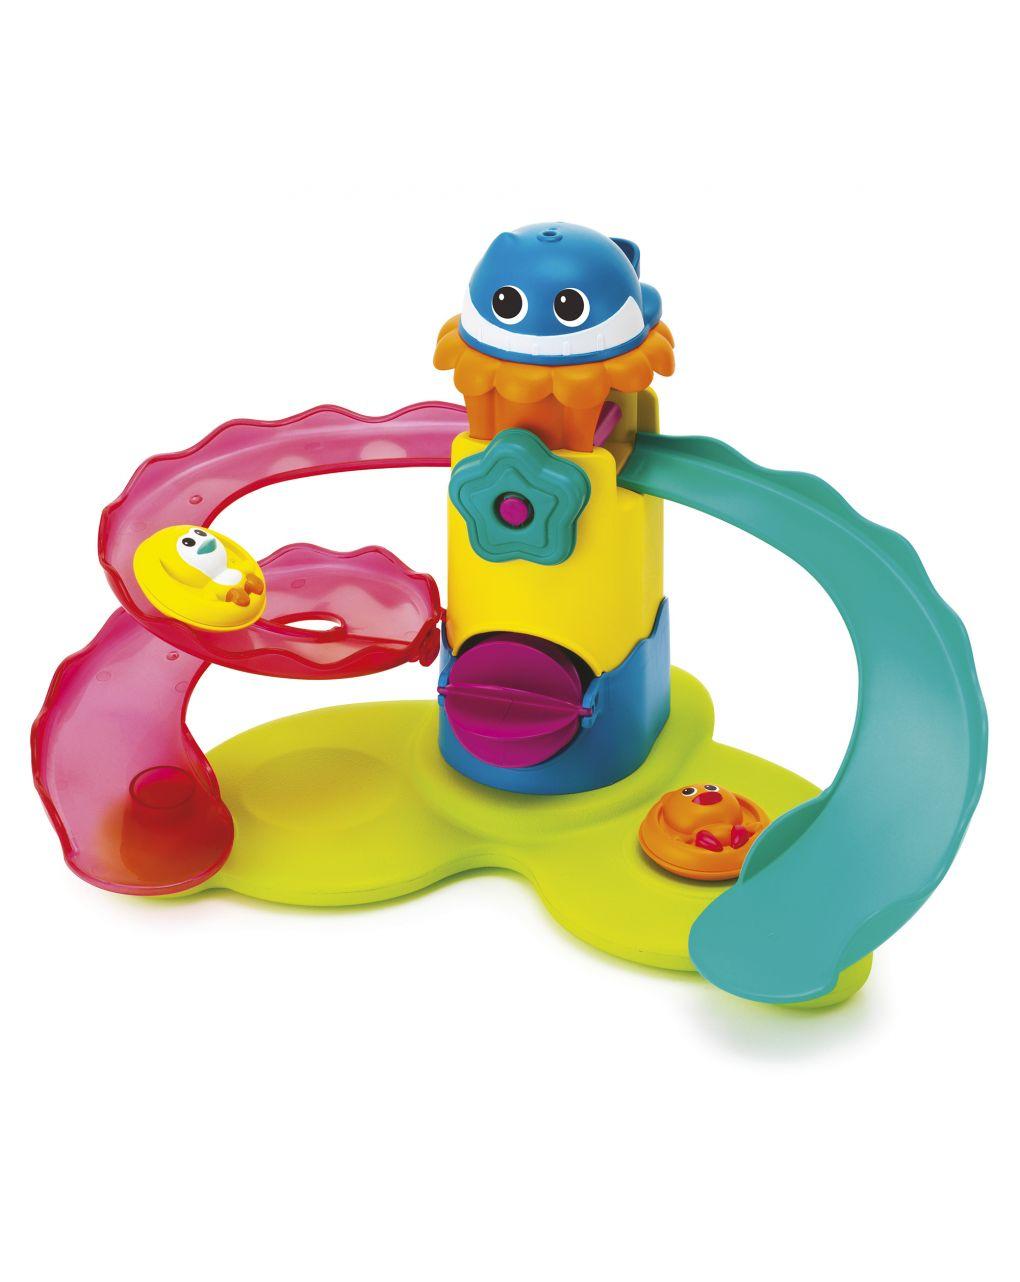 Bkids - parco acquatico gioco per bagnetto - B-kids